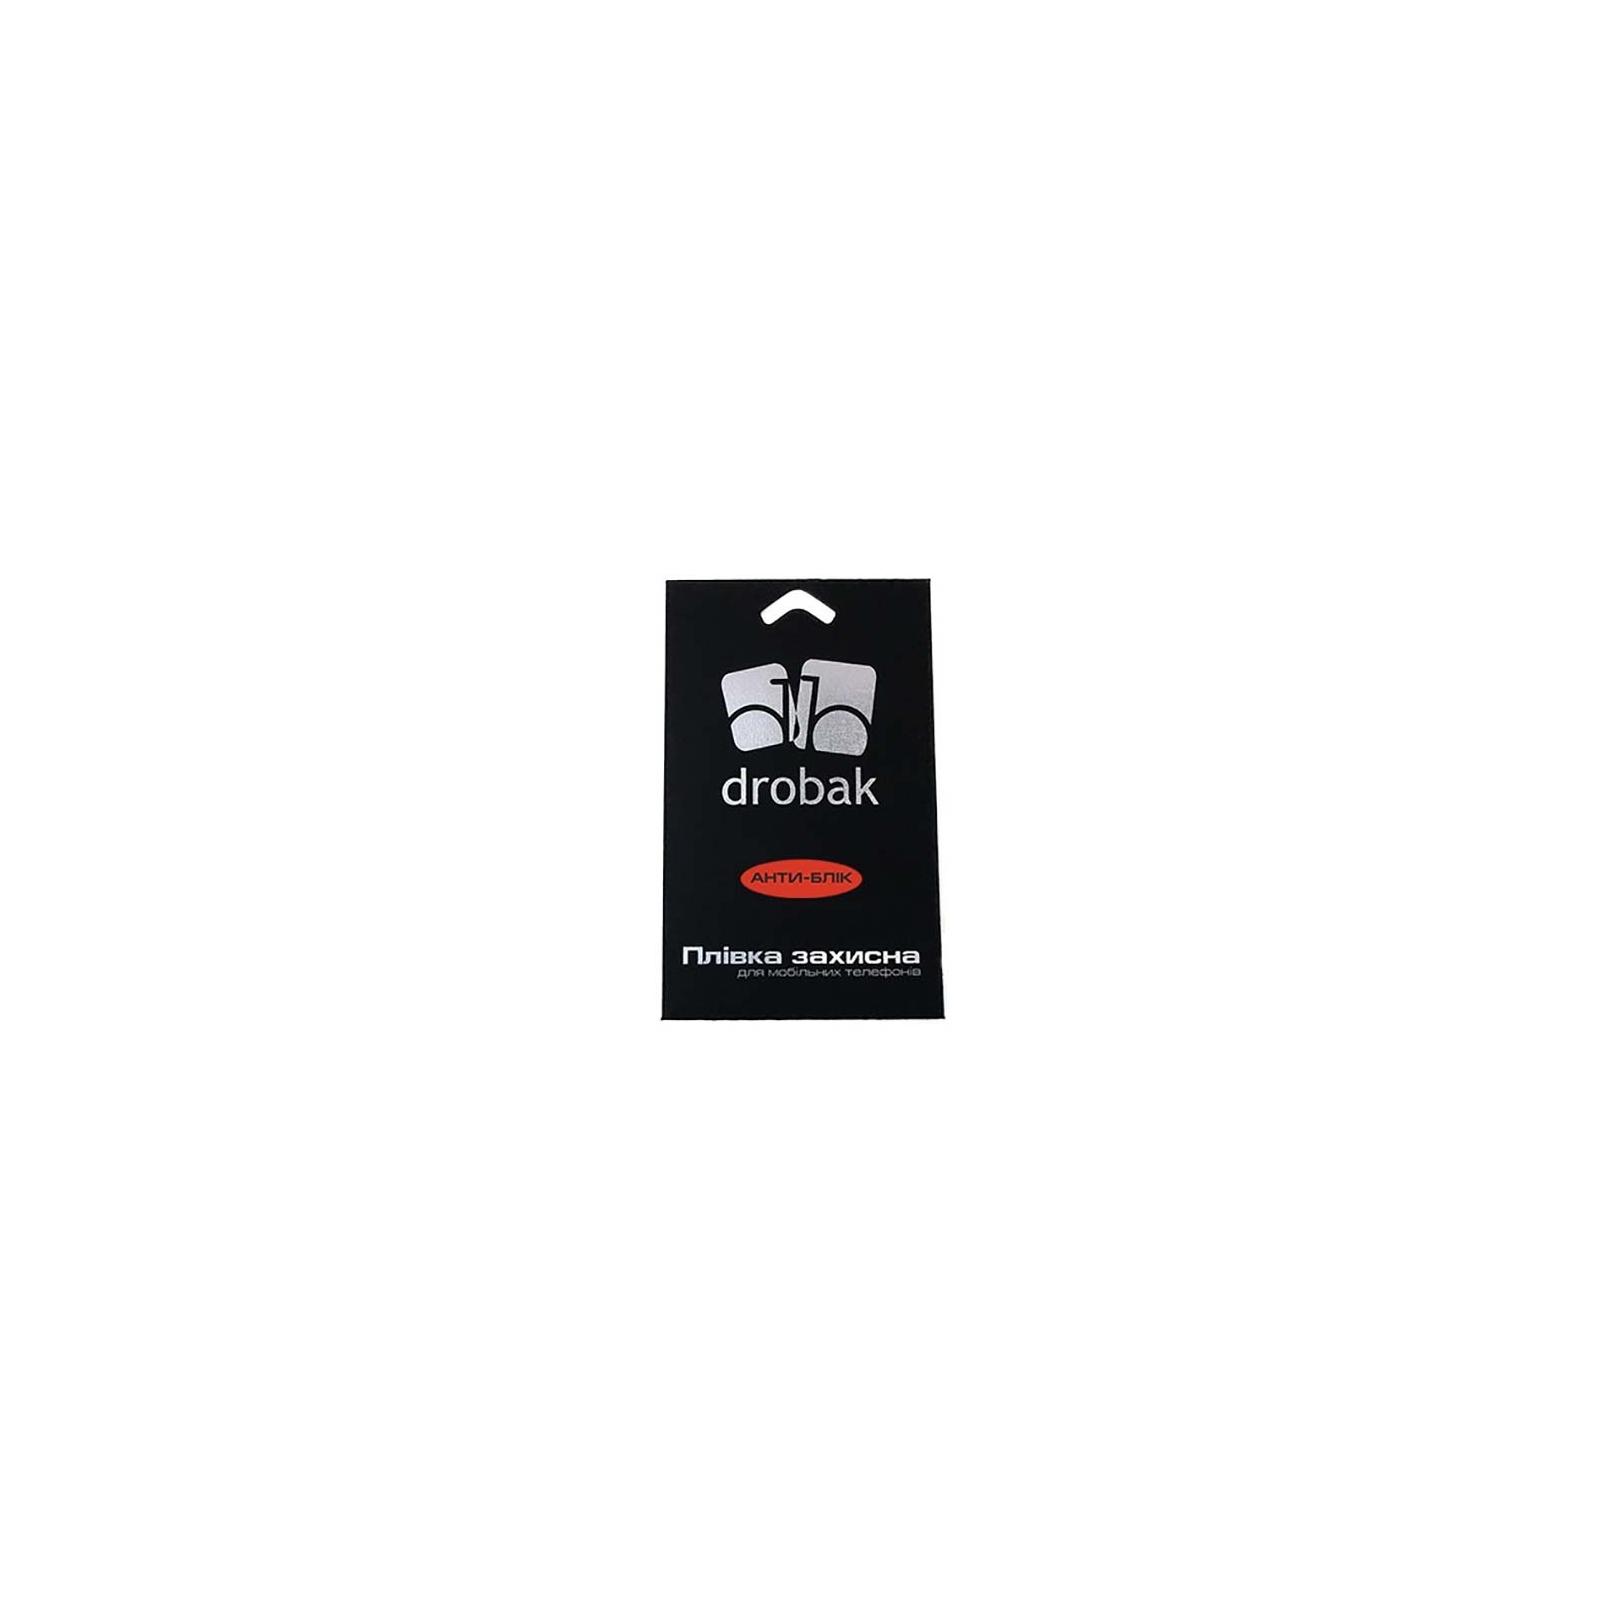 Пленка защитная Drobak для Samsung Galaxy S4 mini I9192 Anti-Glare (508974)